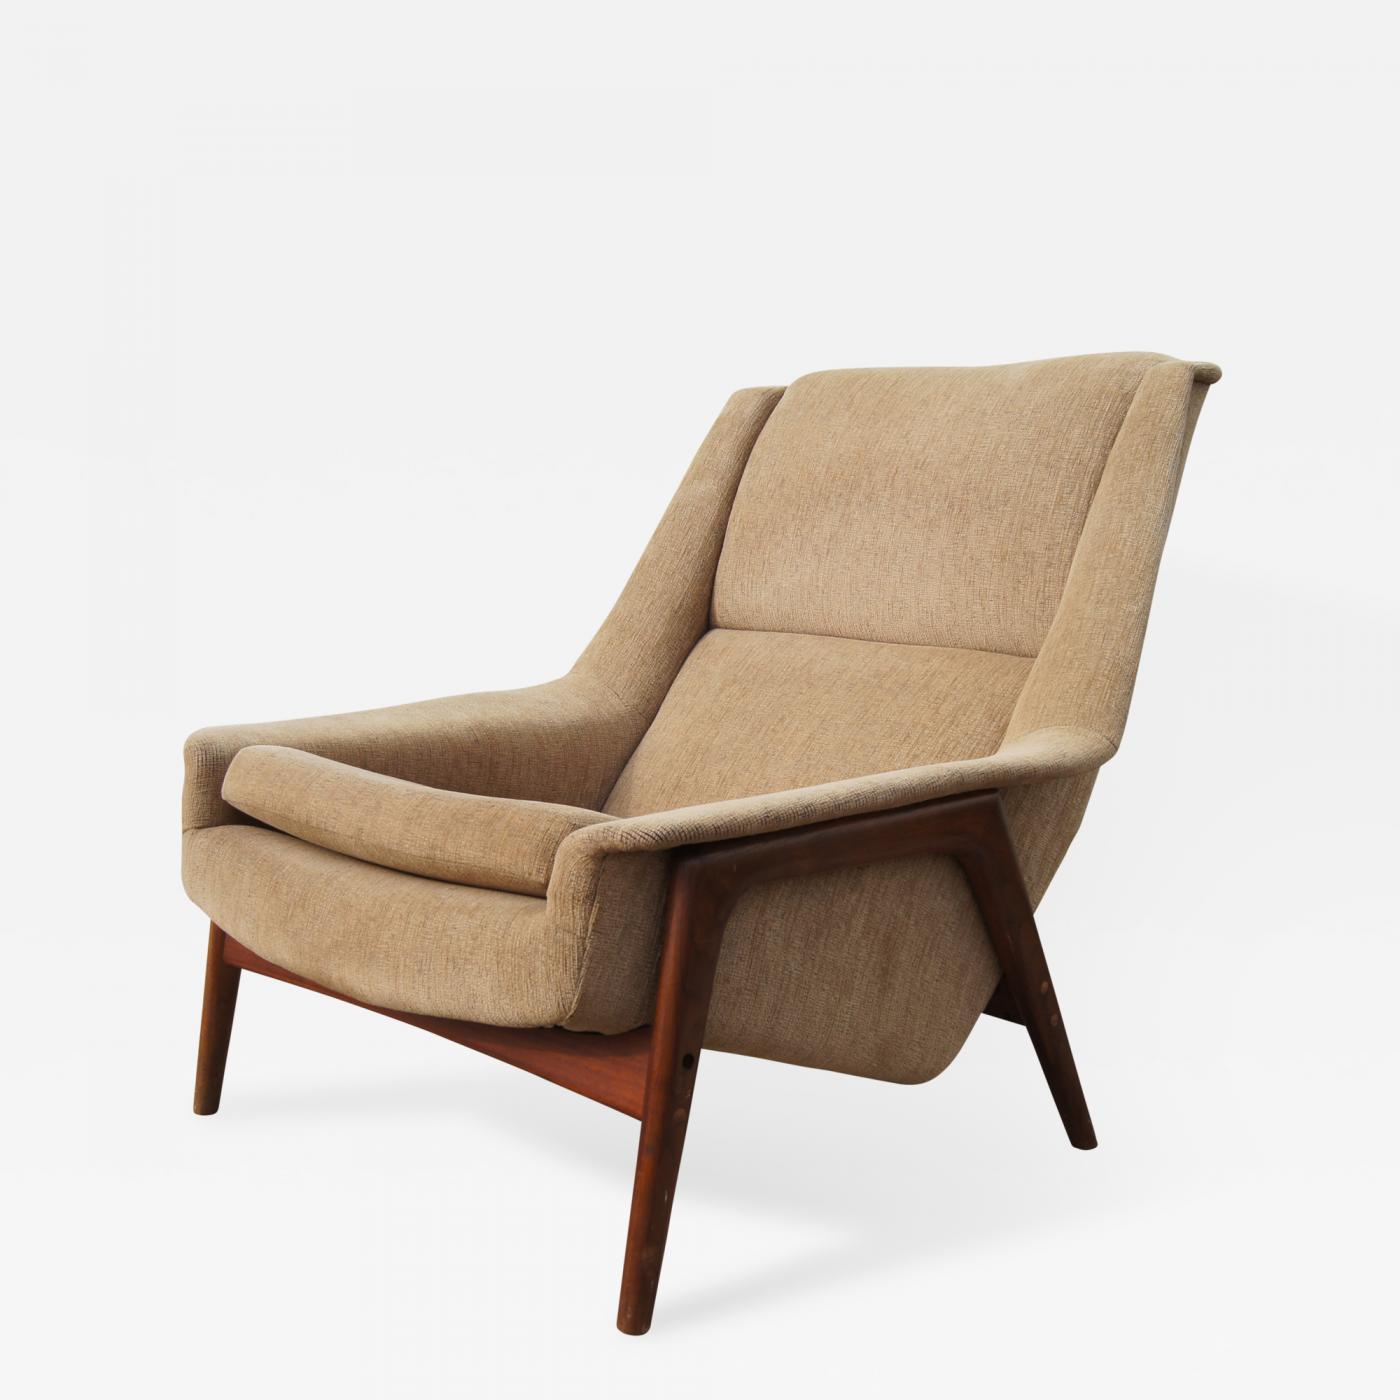 Folke Ohlsson Lounge Chair By Folke Ohlsson For Dux